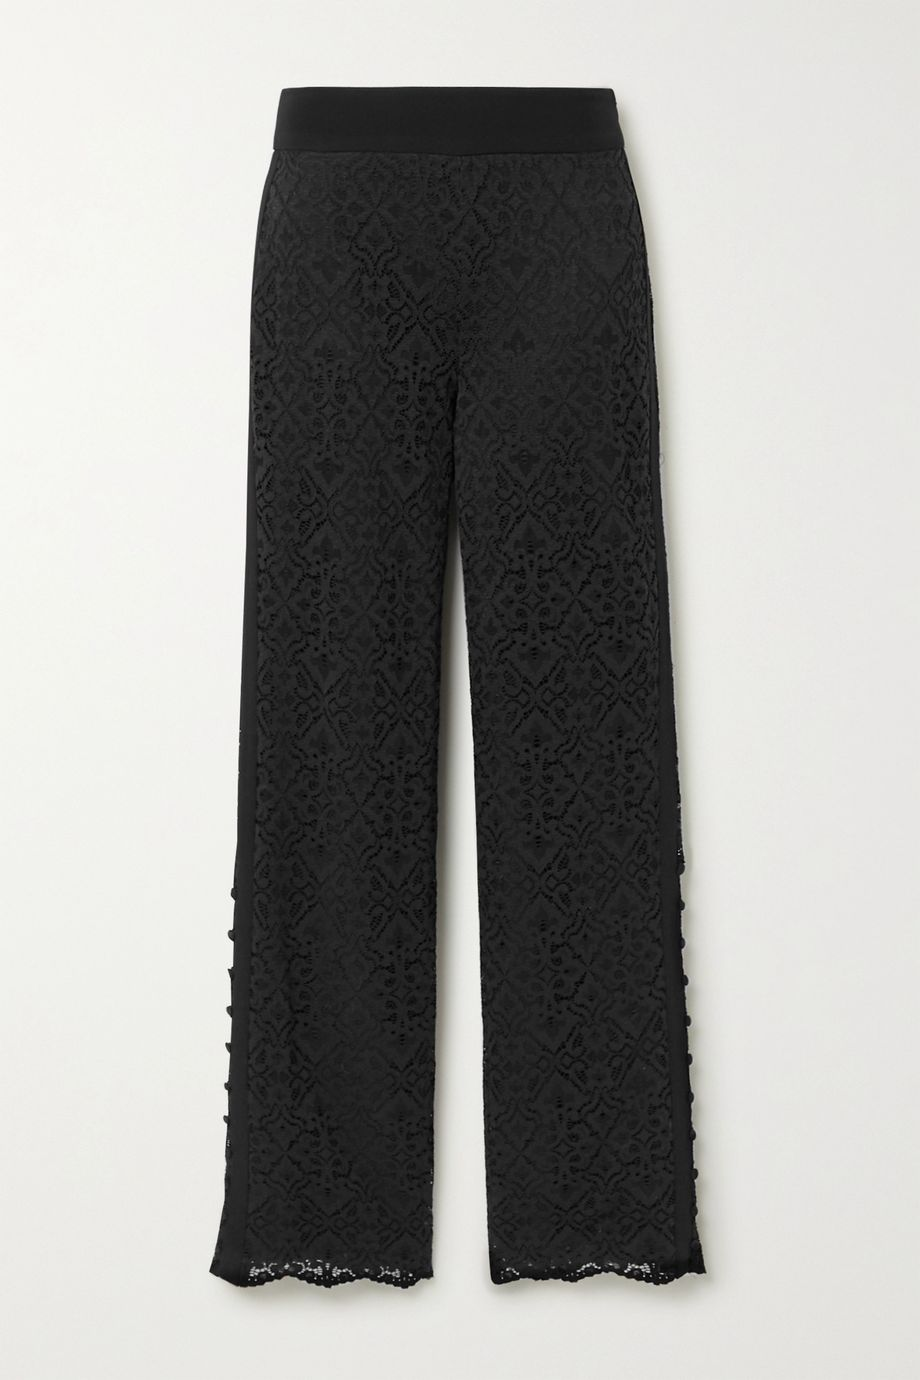 Jonathan Simkhai Crepe-trimmed corded lace straight-leg pants